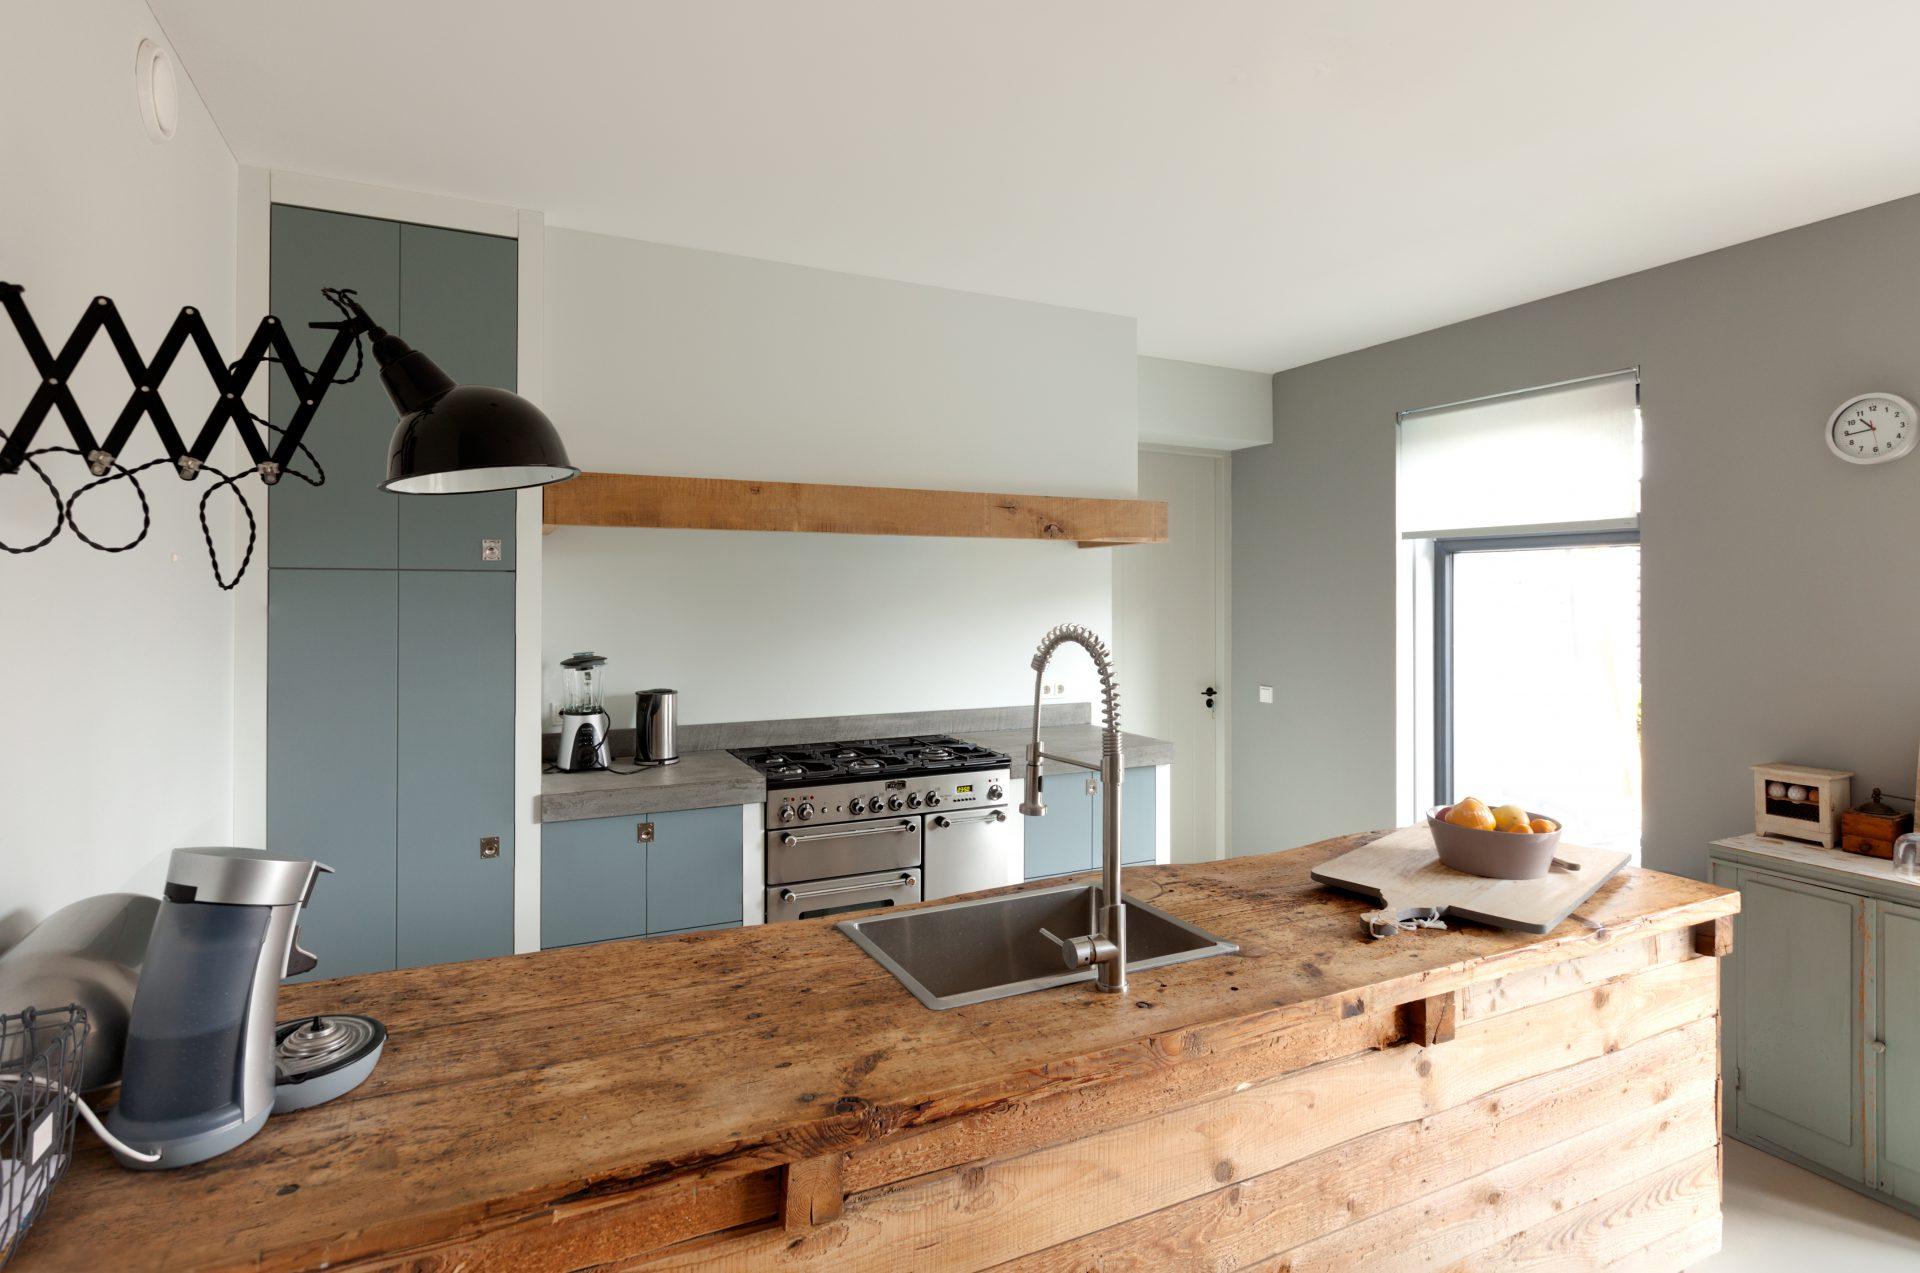 Van Ginkel Keukens : Van ginkel keukens archieven pagina van woonkrant barneveld